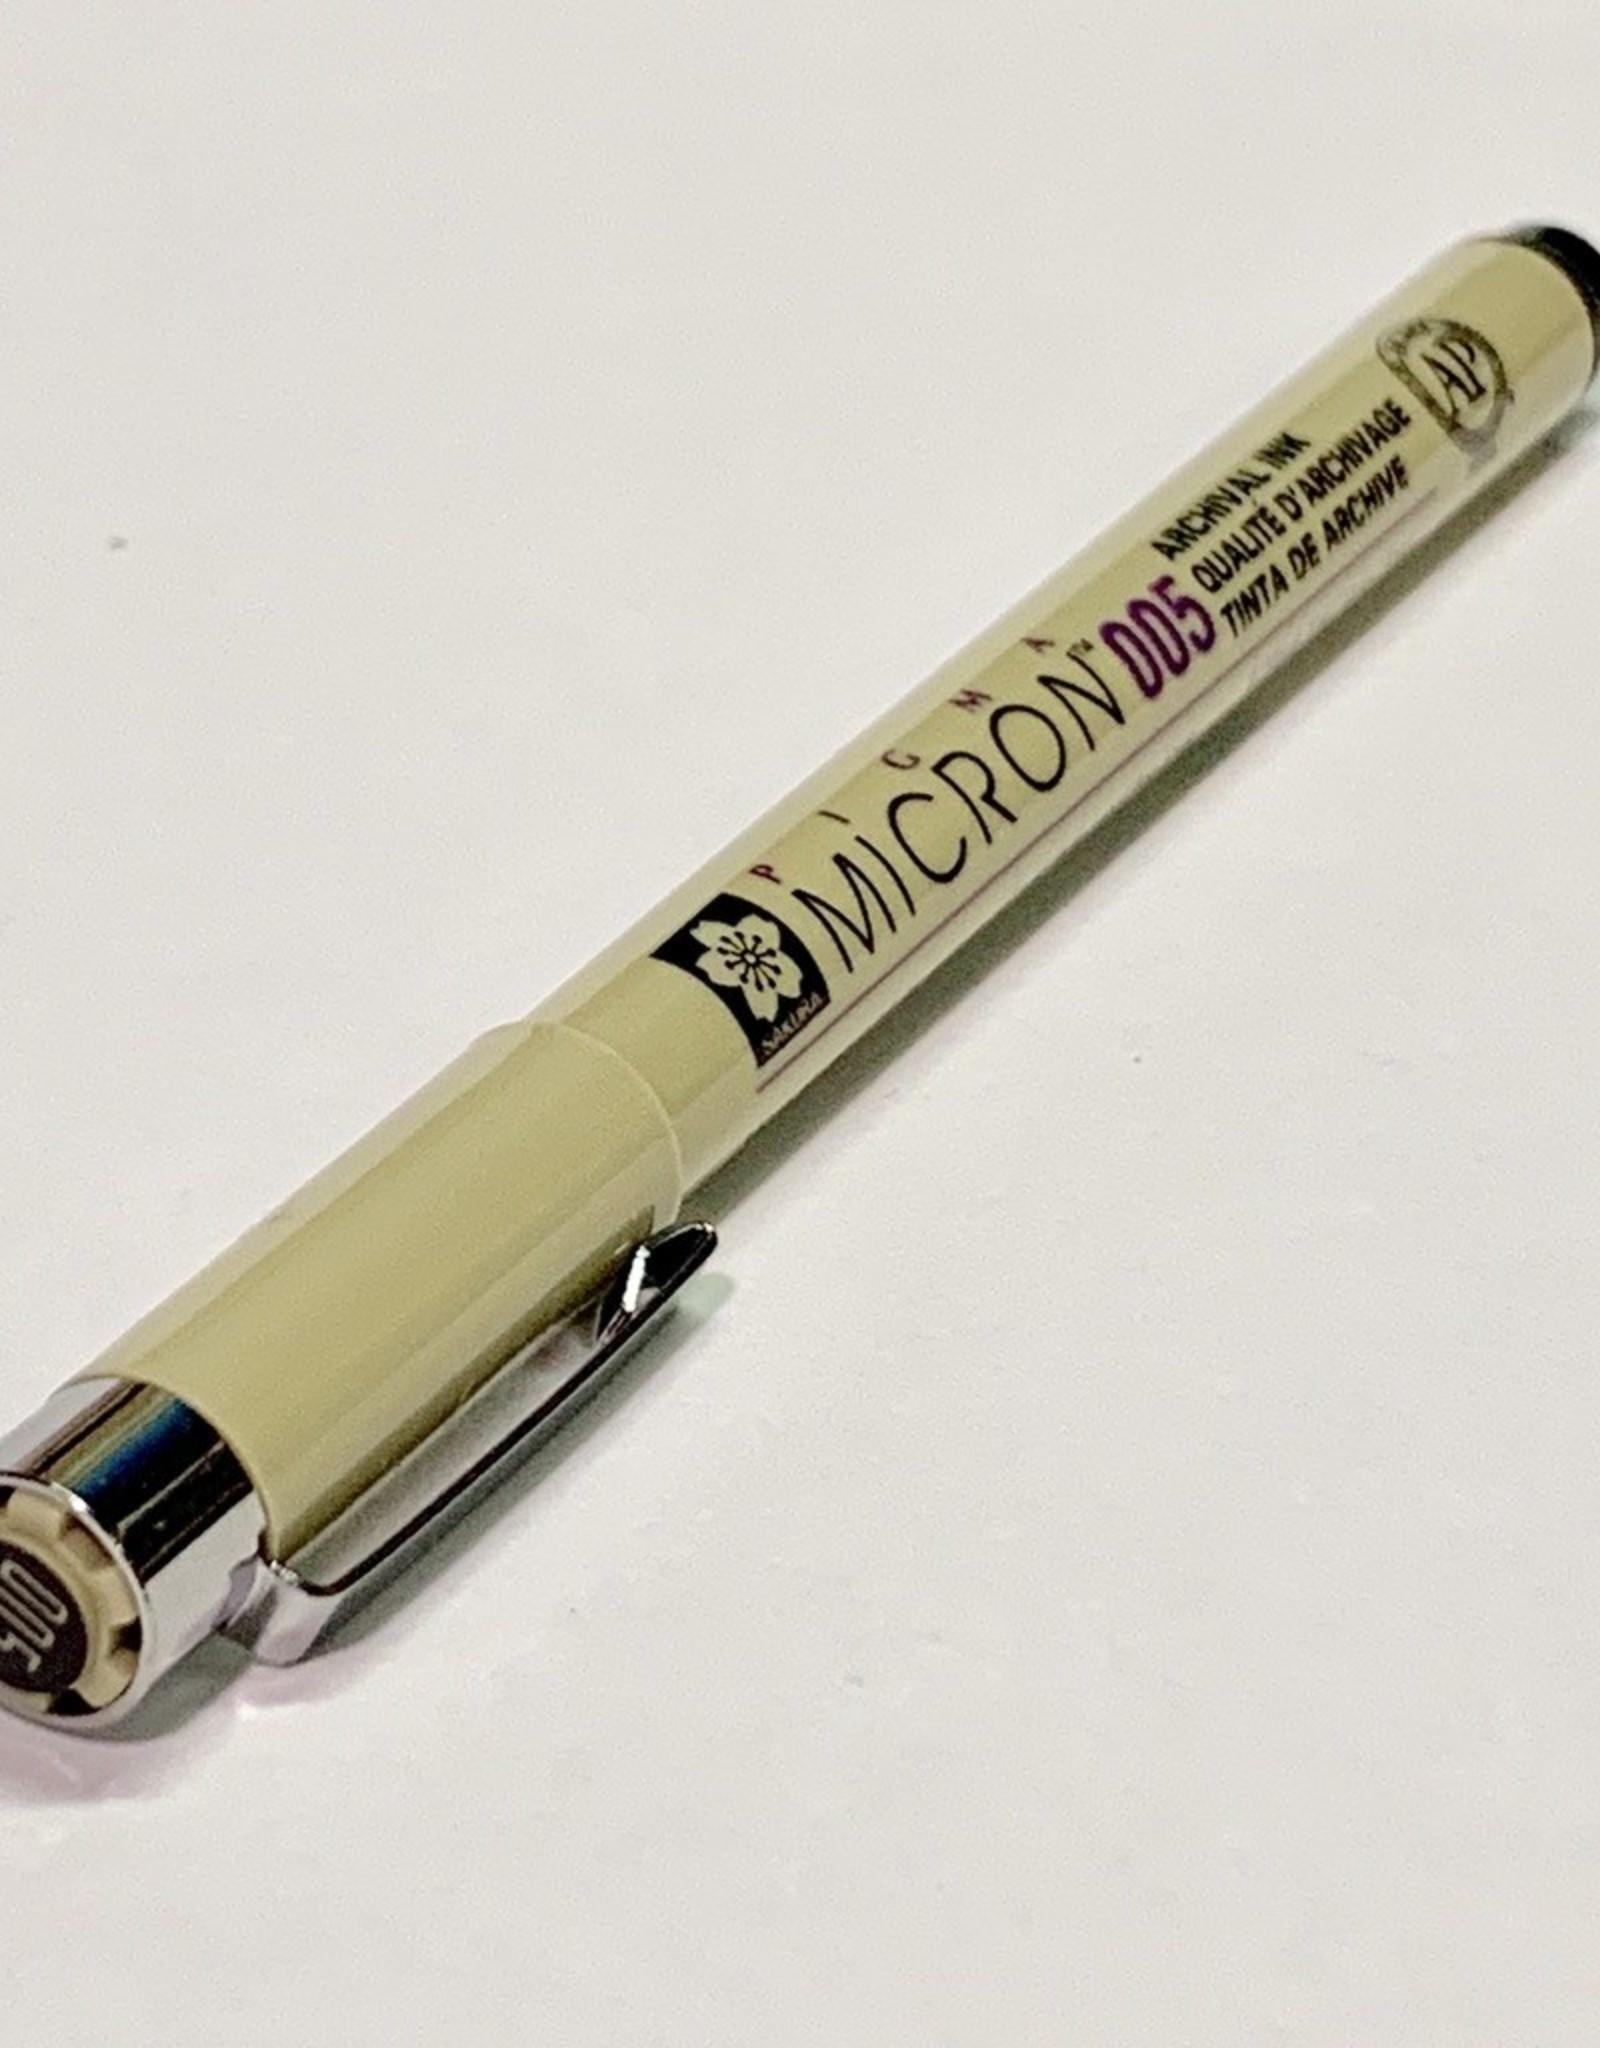 Sakura Micron Black Pen 005 .20mm